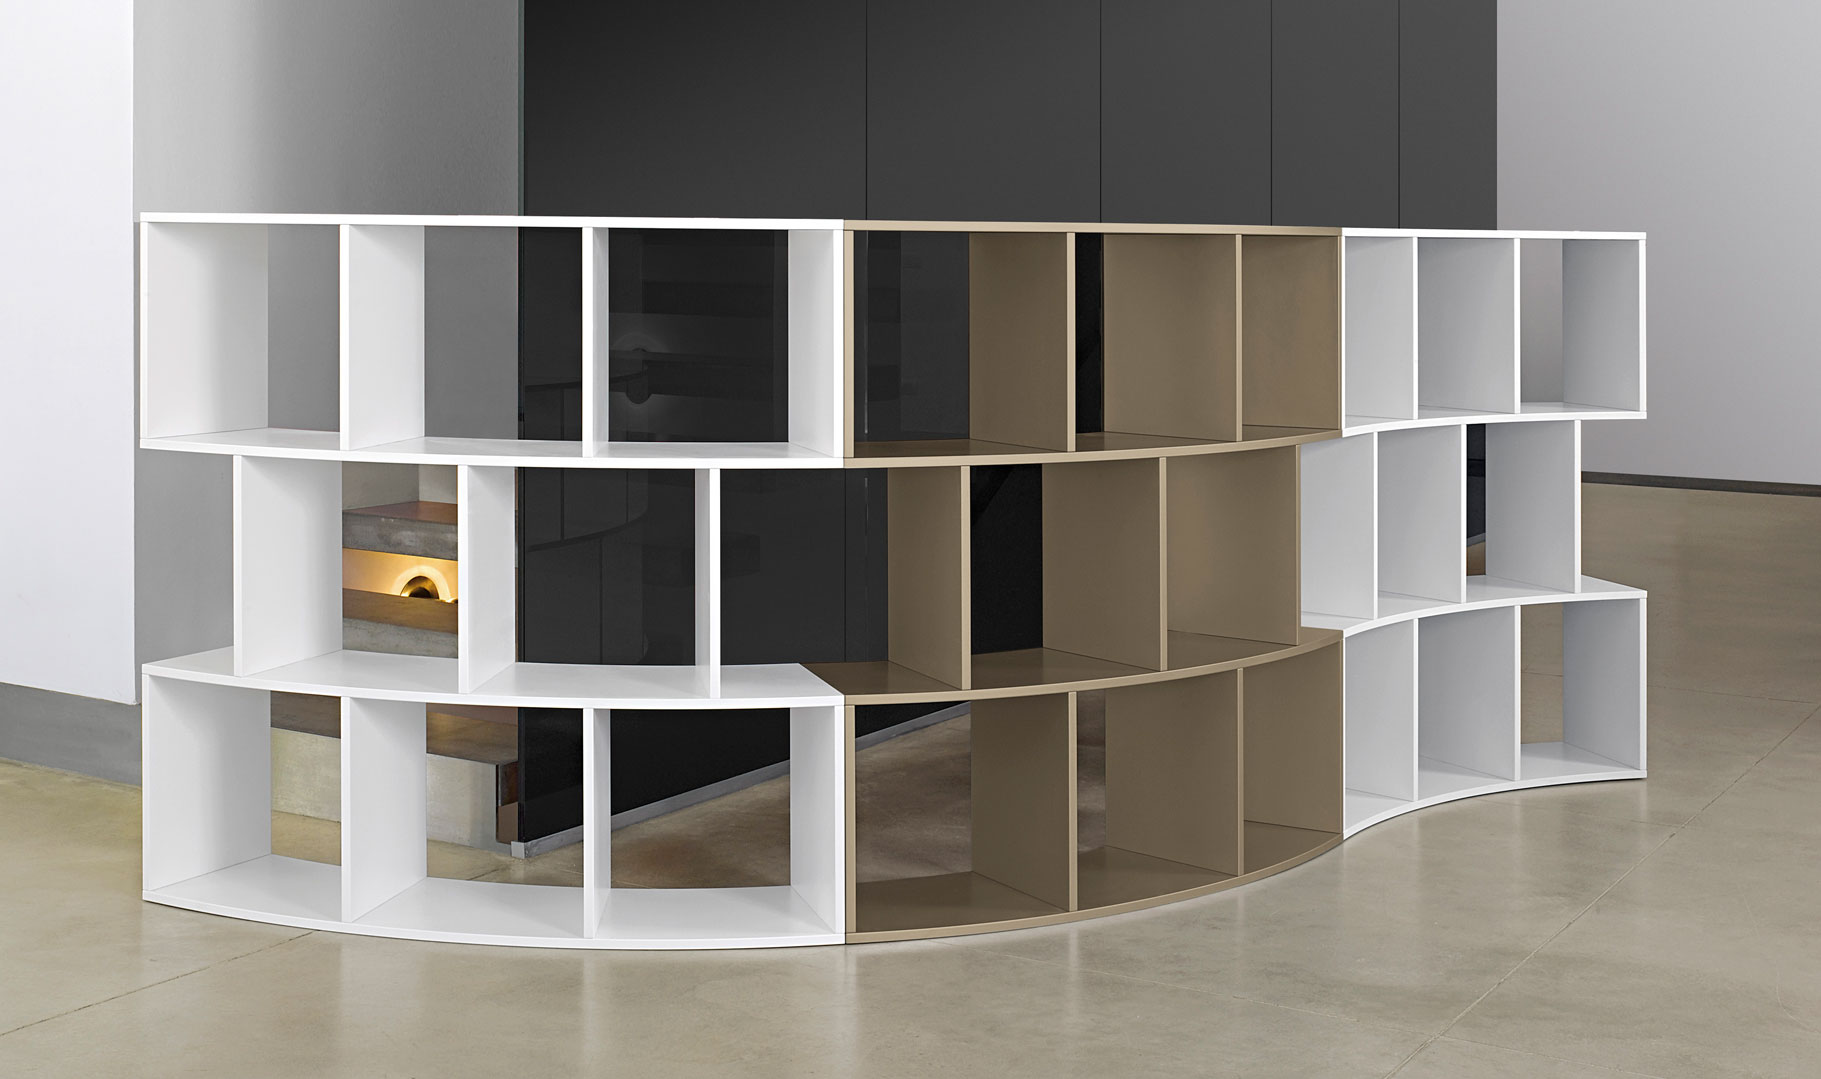 River Bookcase By Antonello Italia, Italy #Luxurystyle #Bookcase #Interiordesign